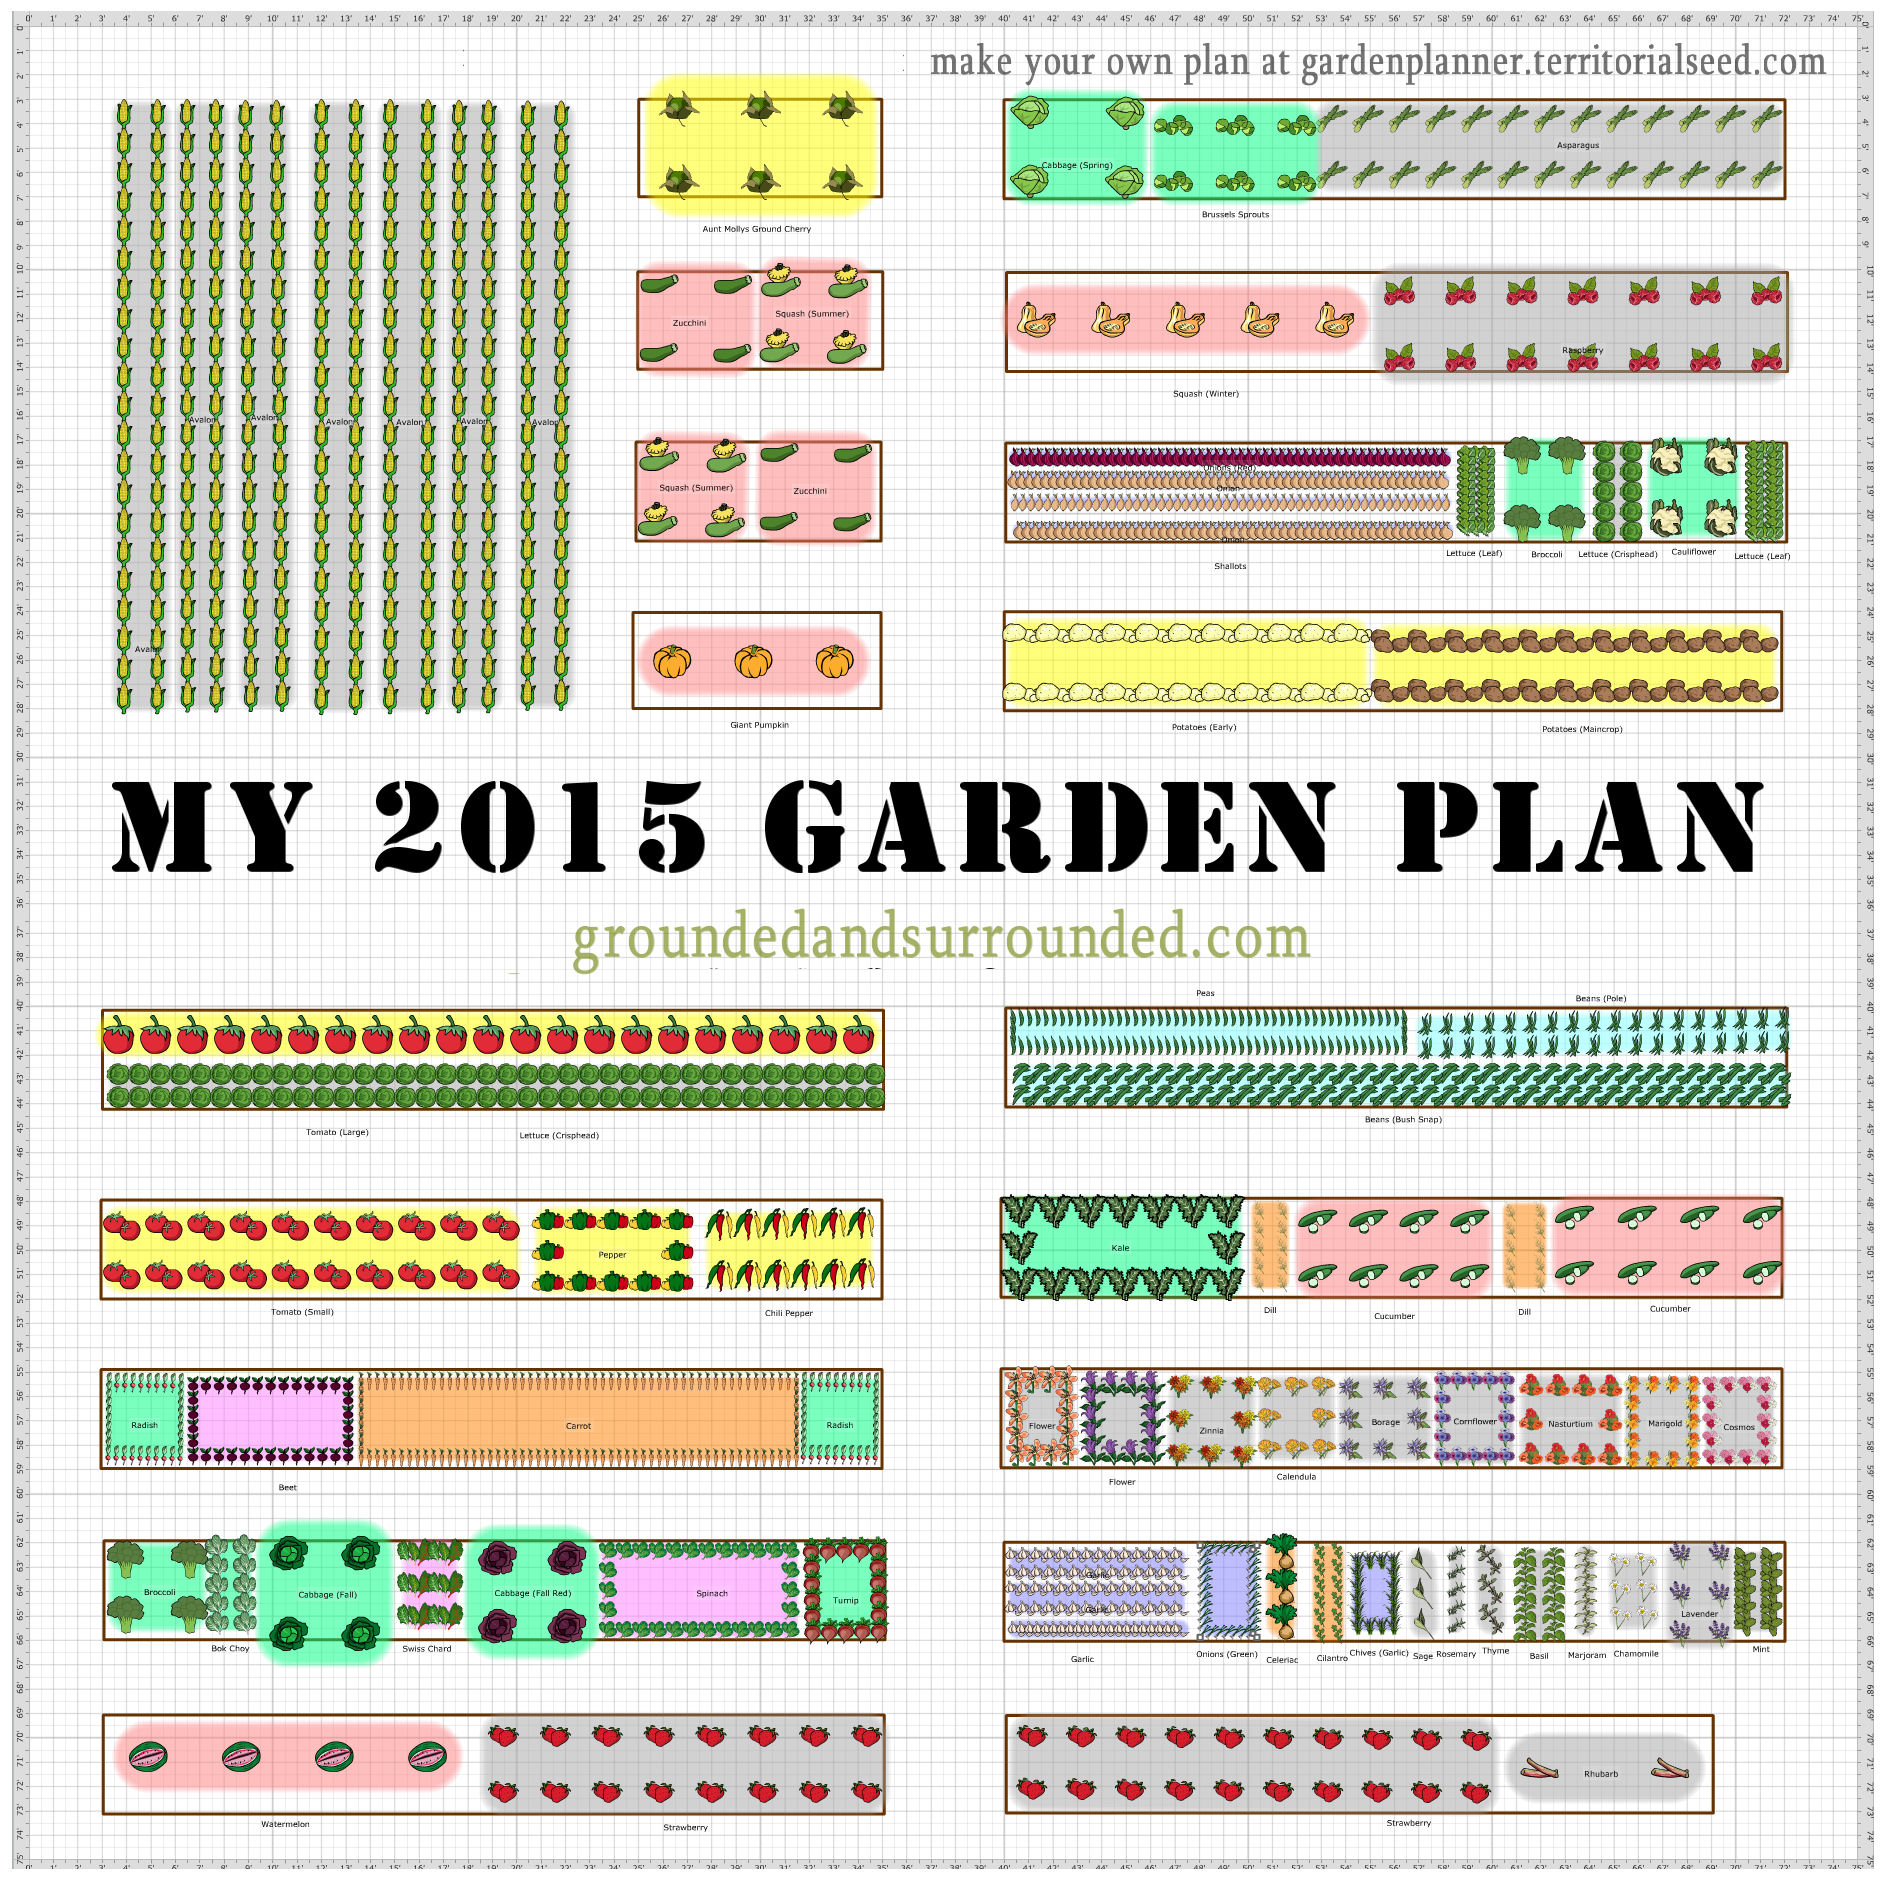 My 5 000 Sq Ft Vegetable Garden Plan